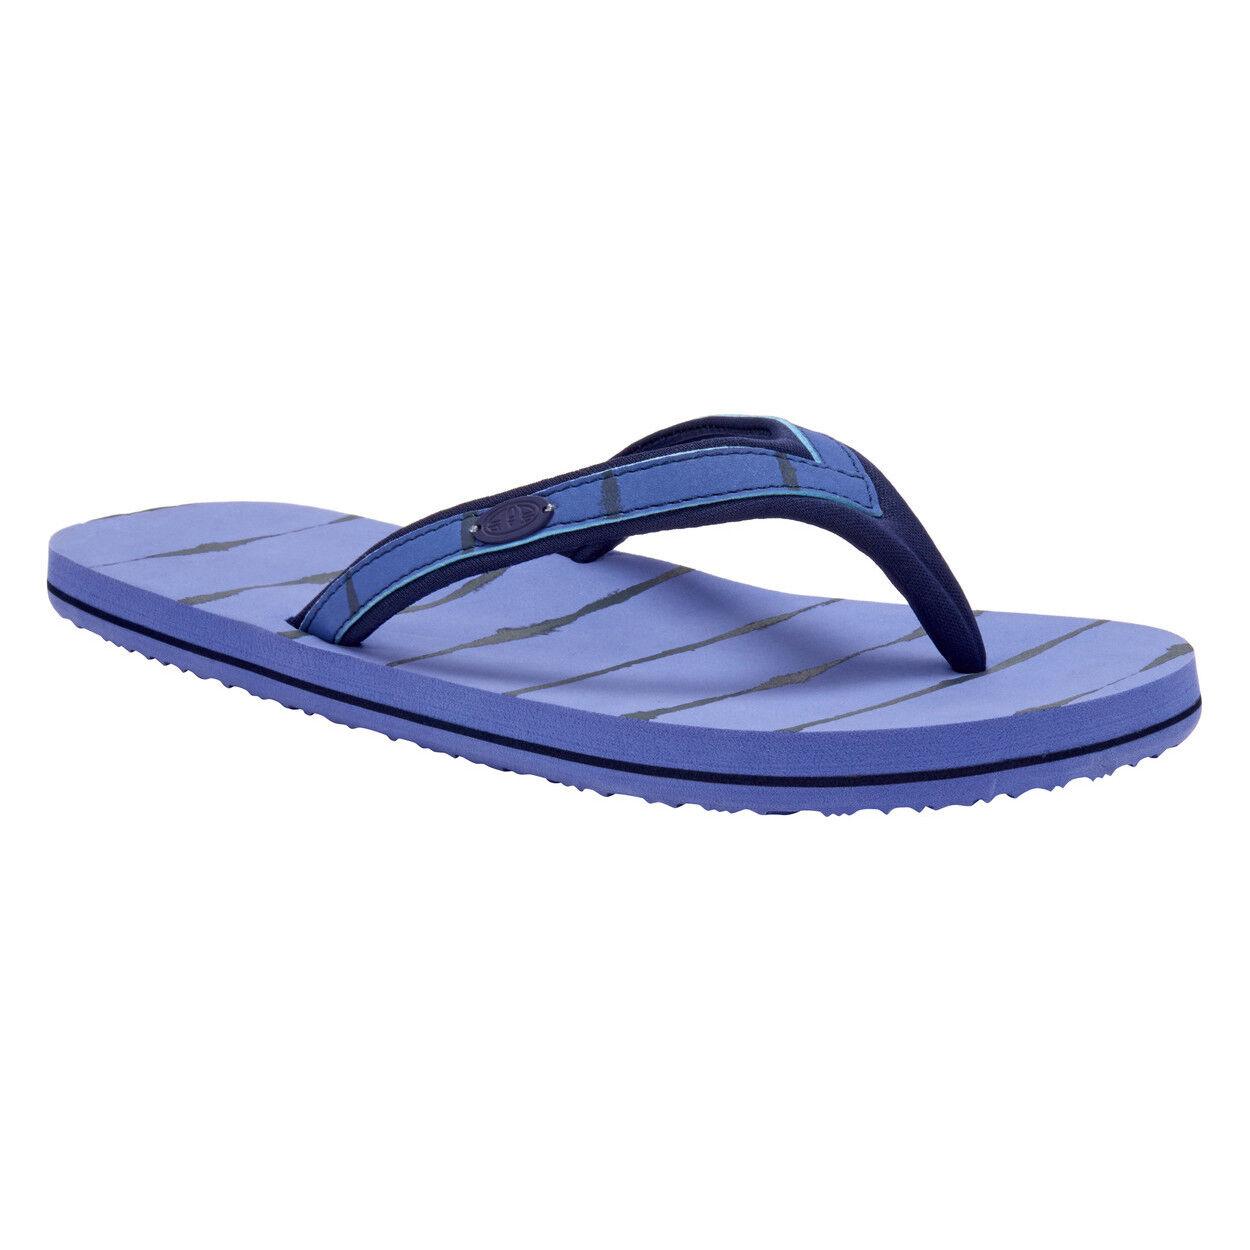 ANIMAL Flip NEW Womens Swish Slim Upper AOP Flip ANIMAL Flops Dusty Blue BNWT ac0d7f